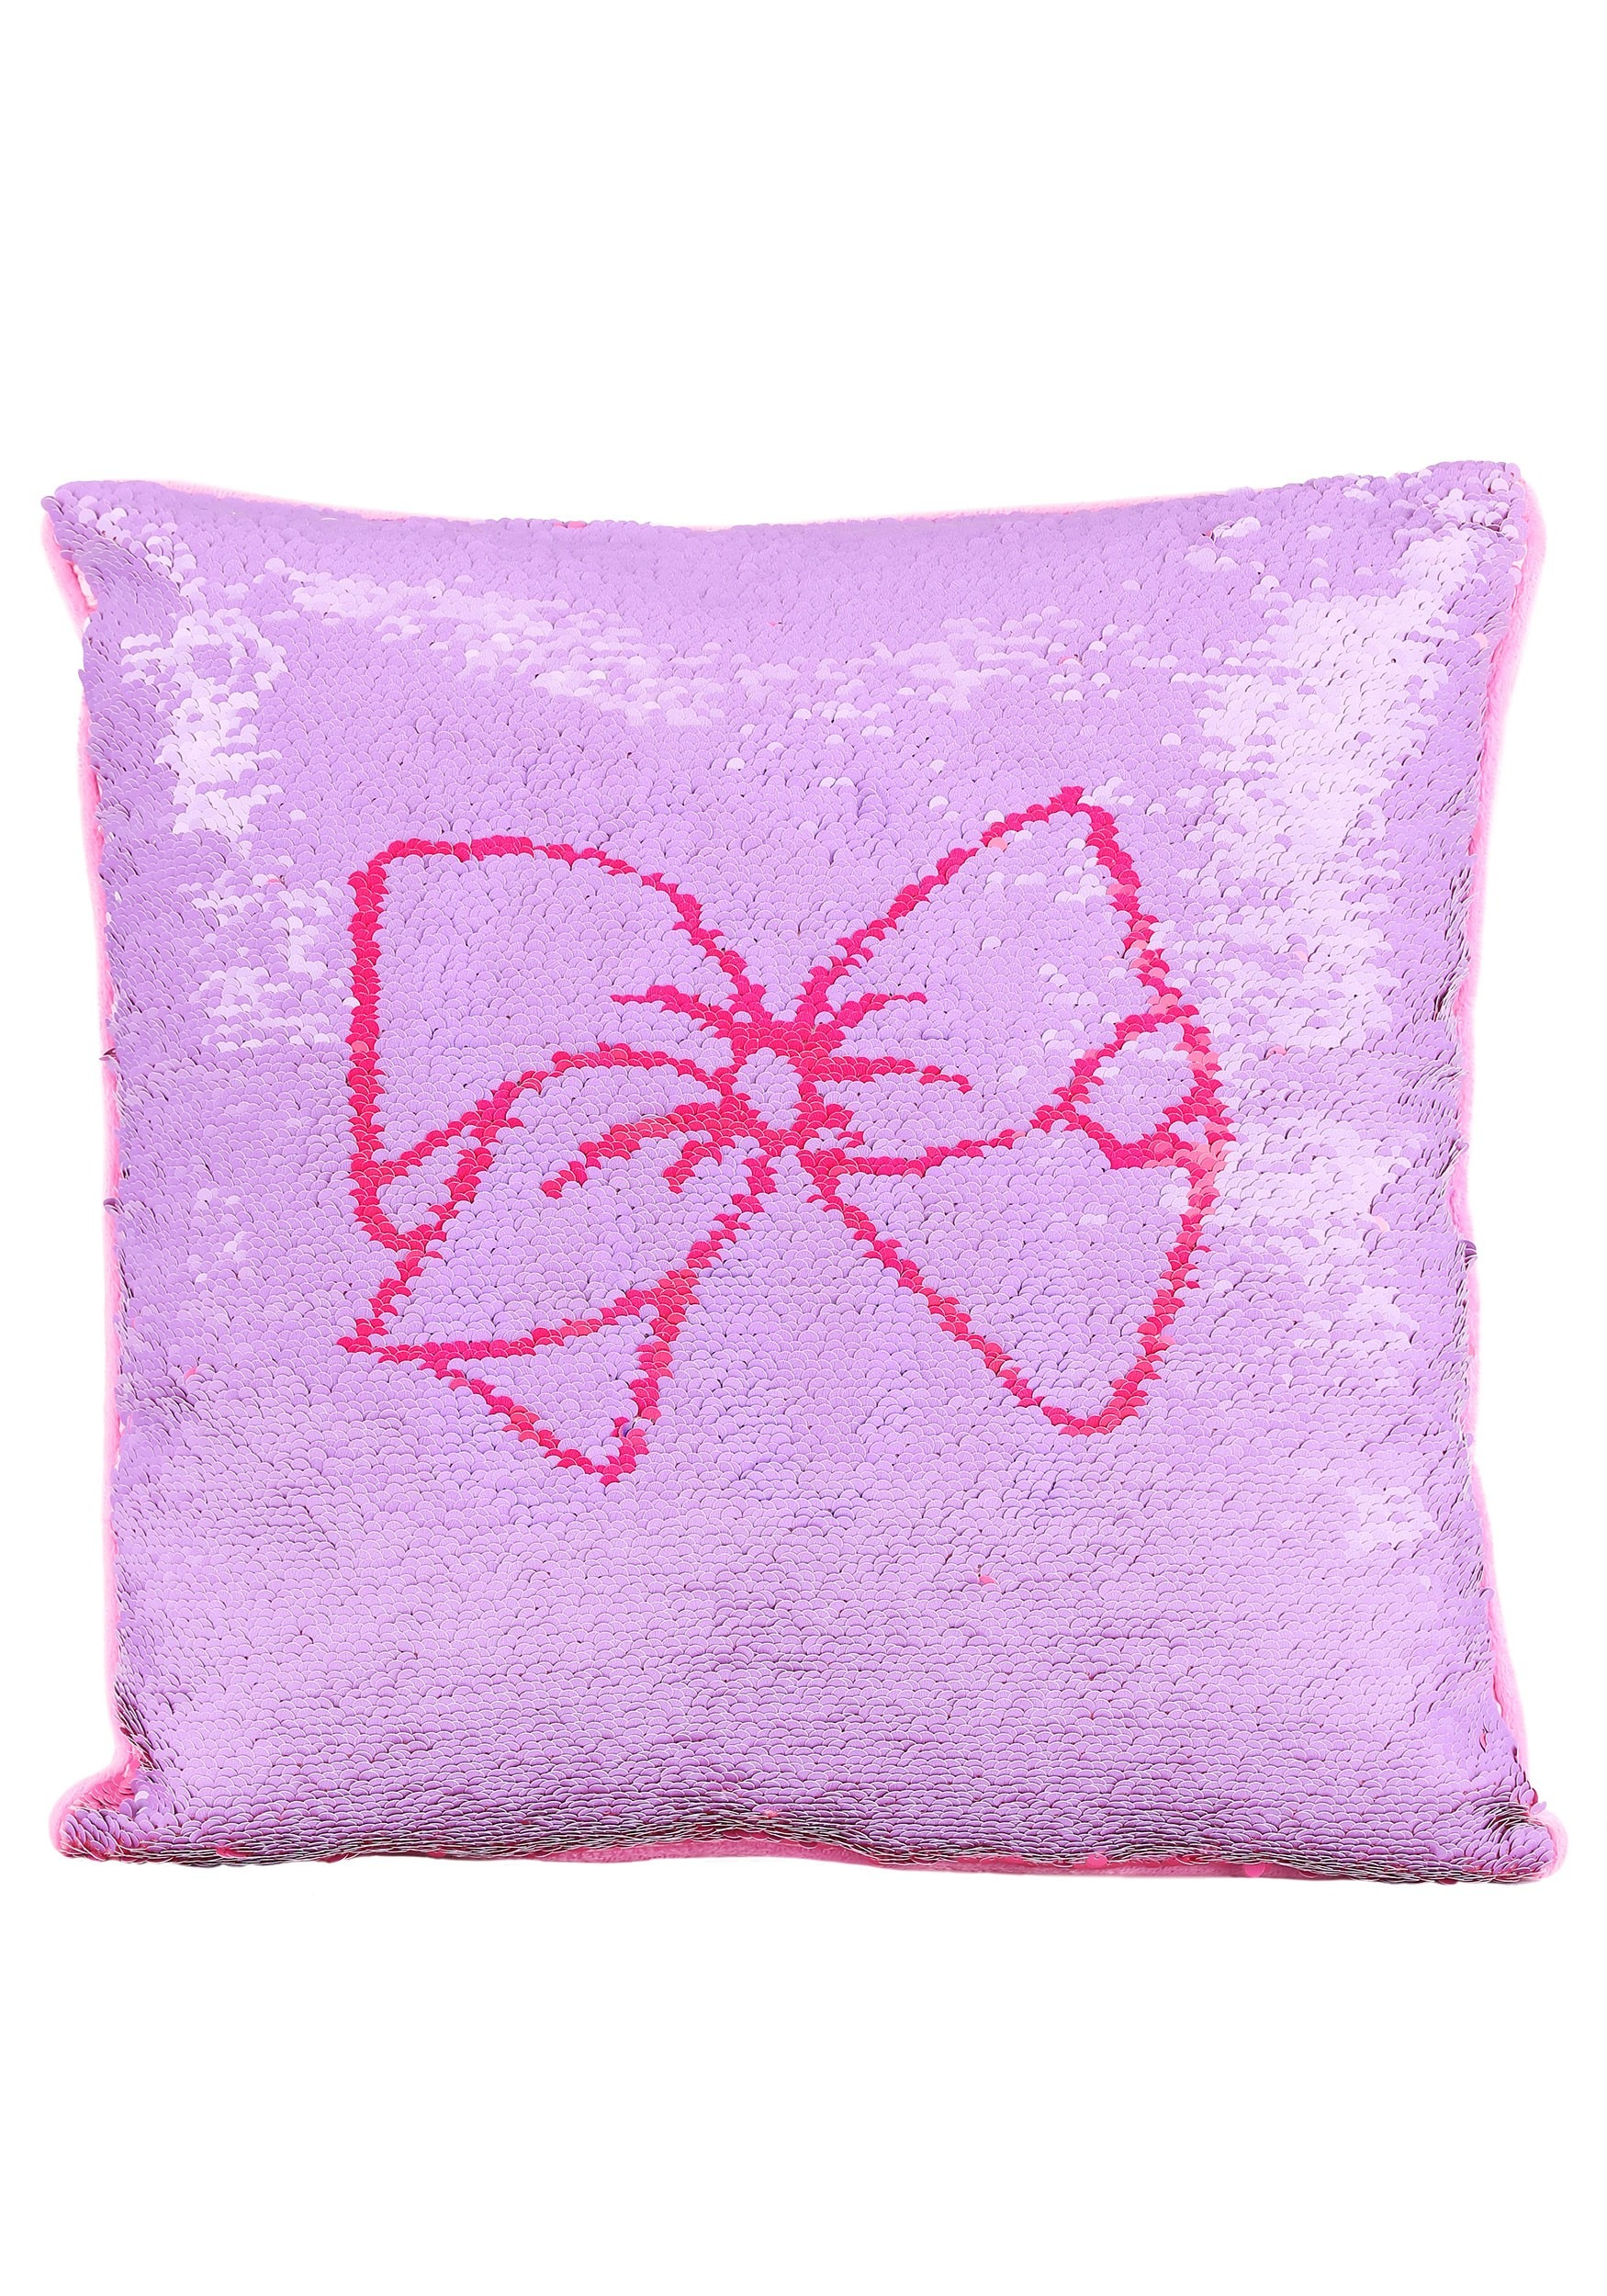 jojo siwa 16 x16 sequin pillow